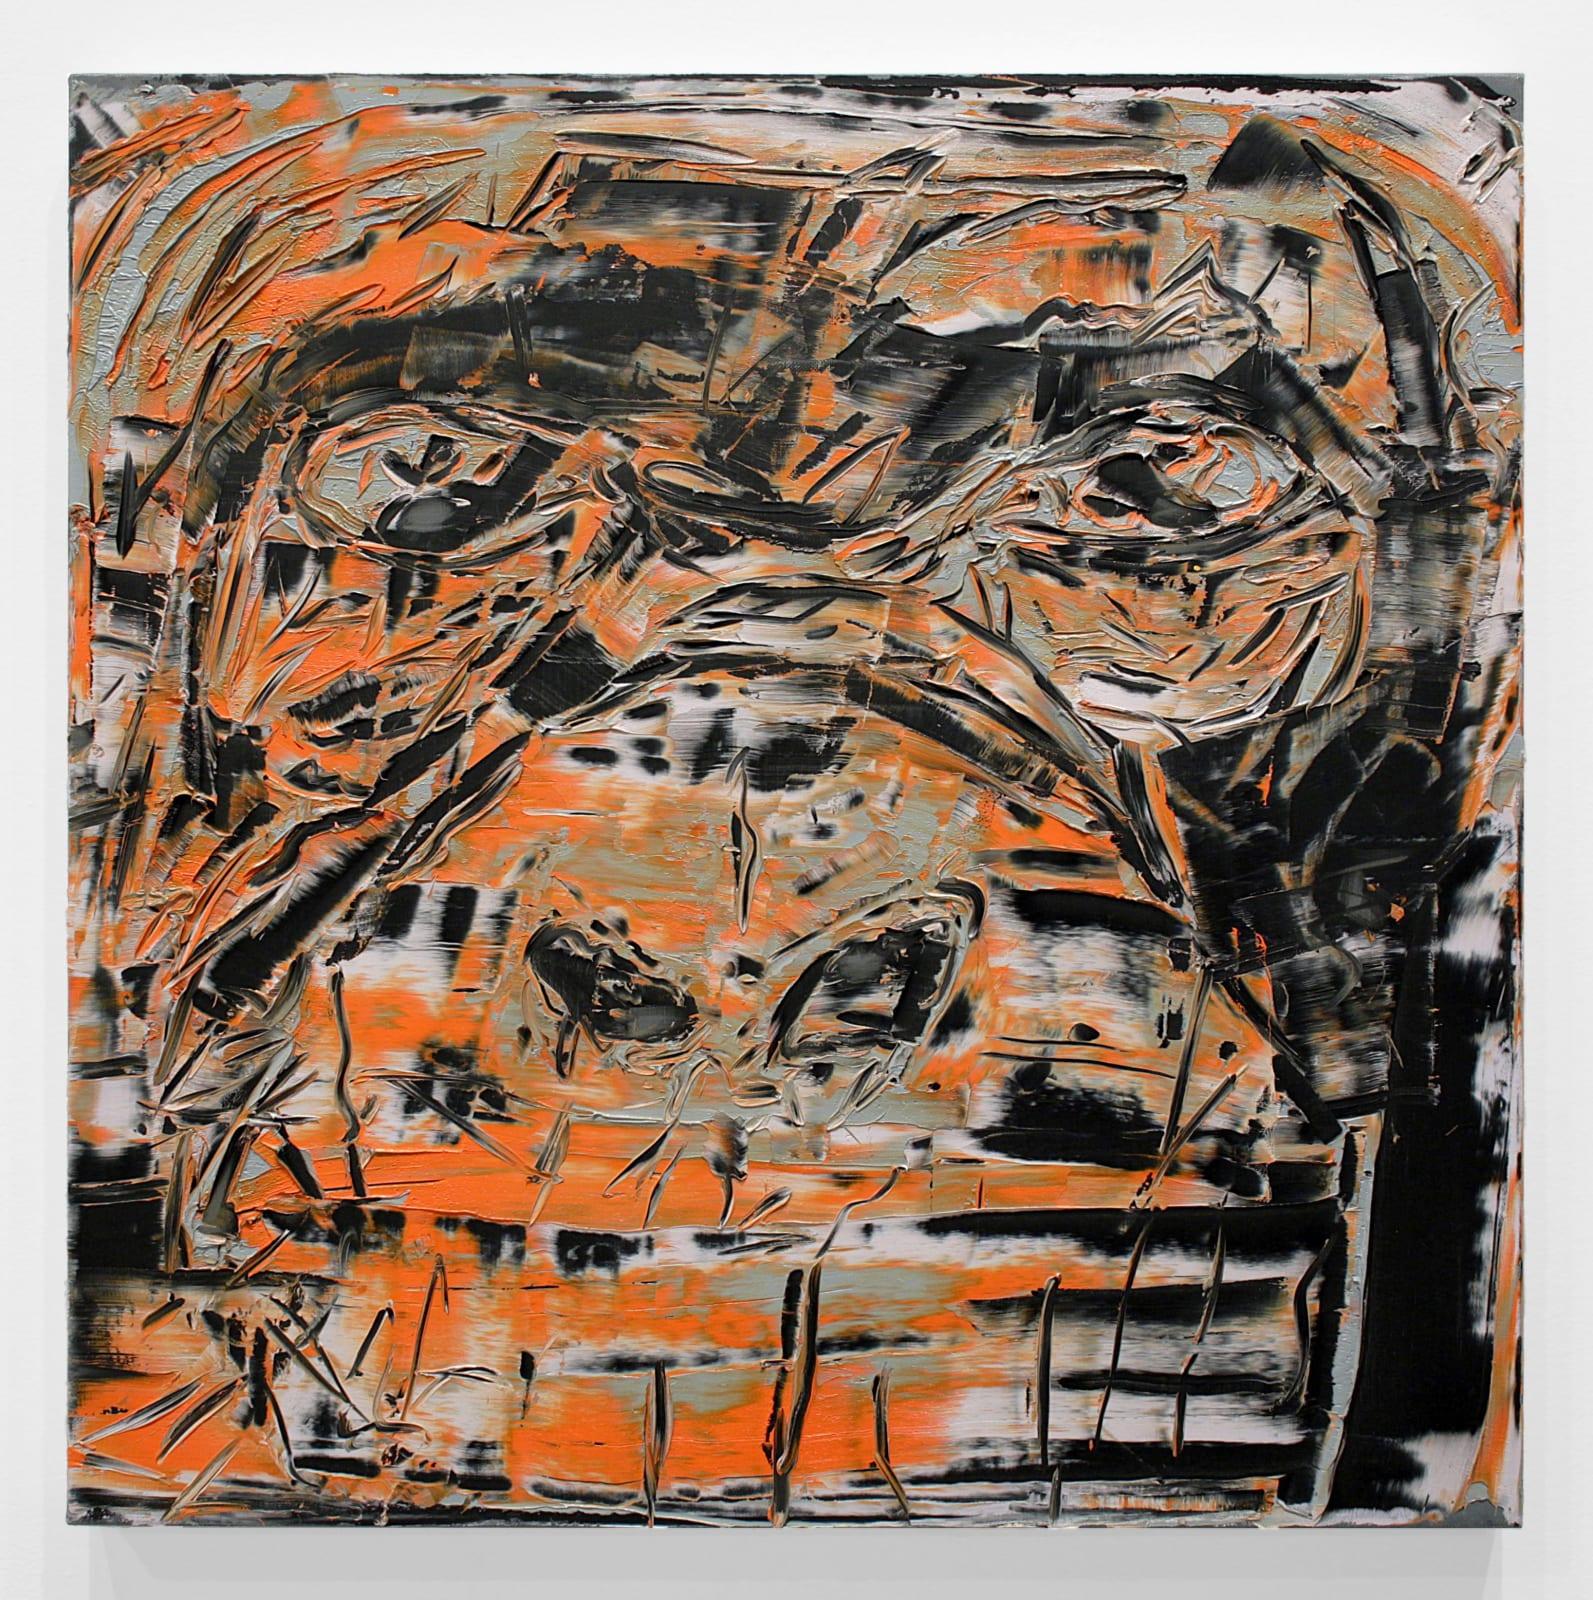 Gilad Efrat, Ape, 2013 oil on linen, 27 1/2 x 27 1/2 in